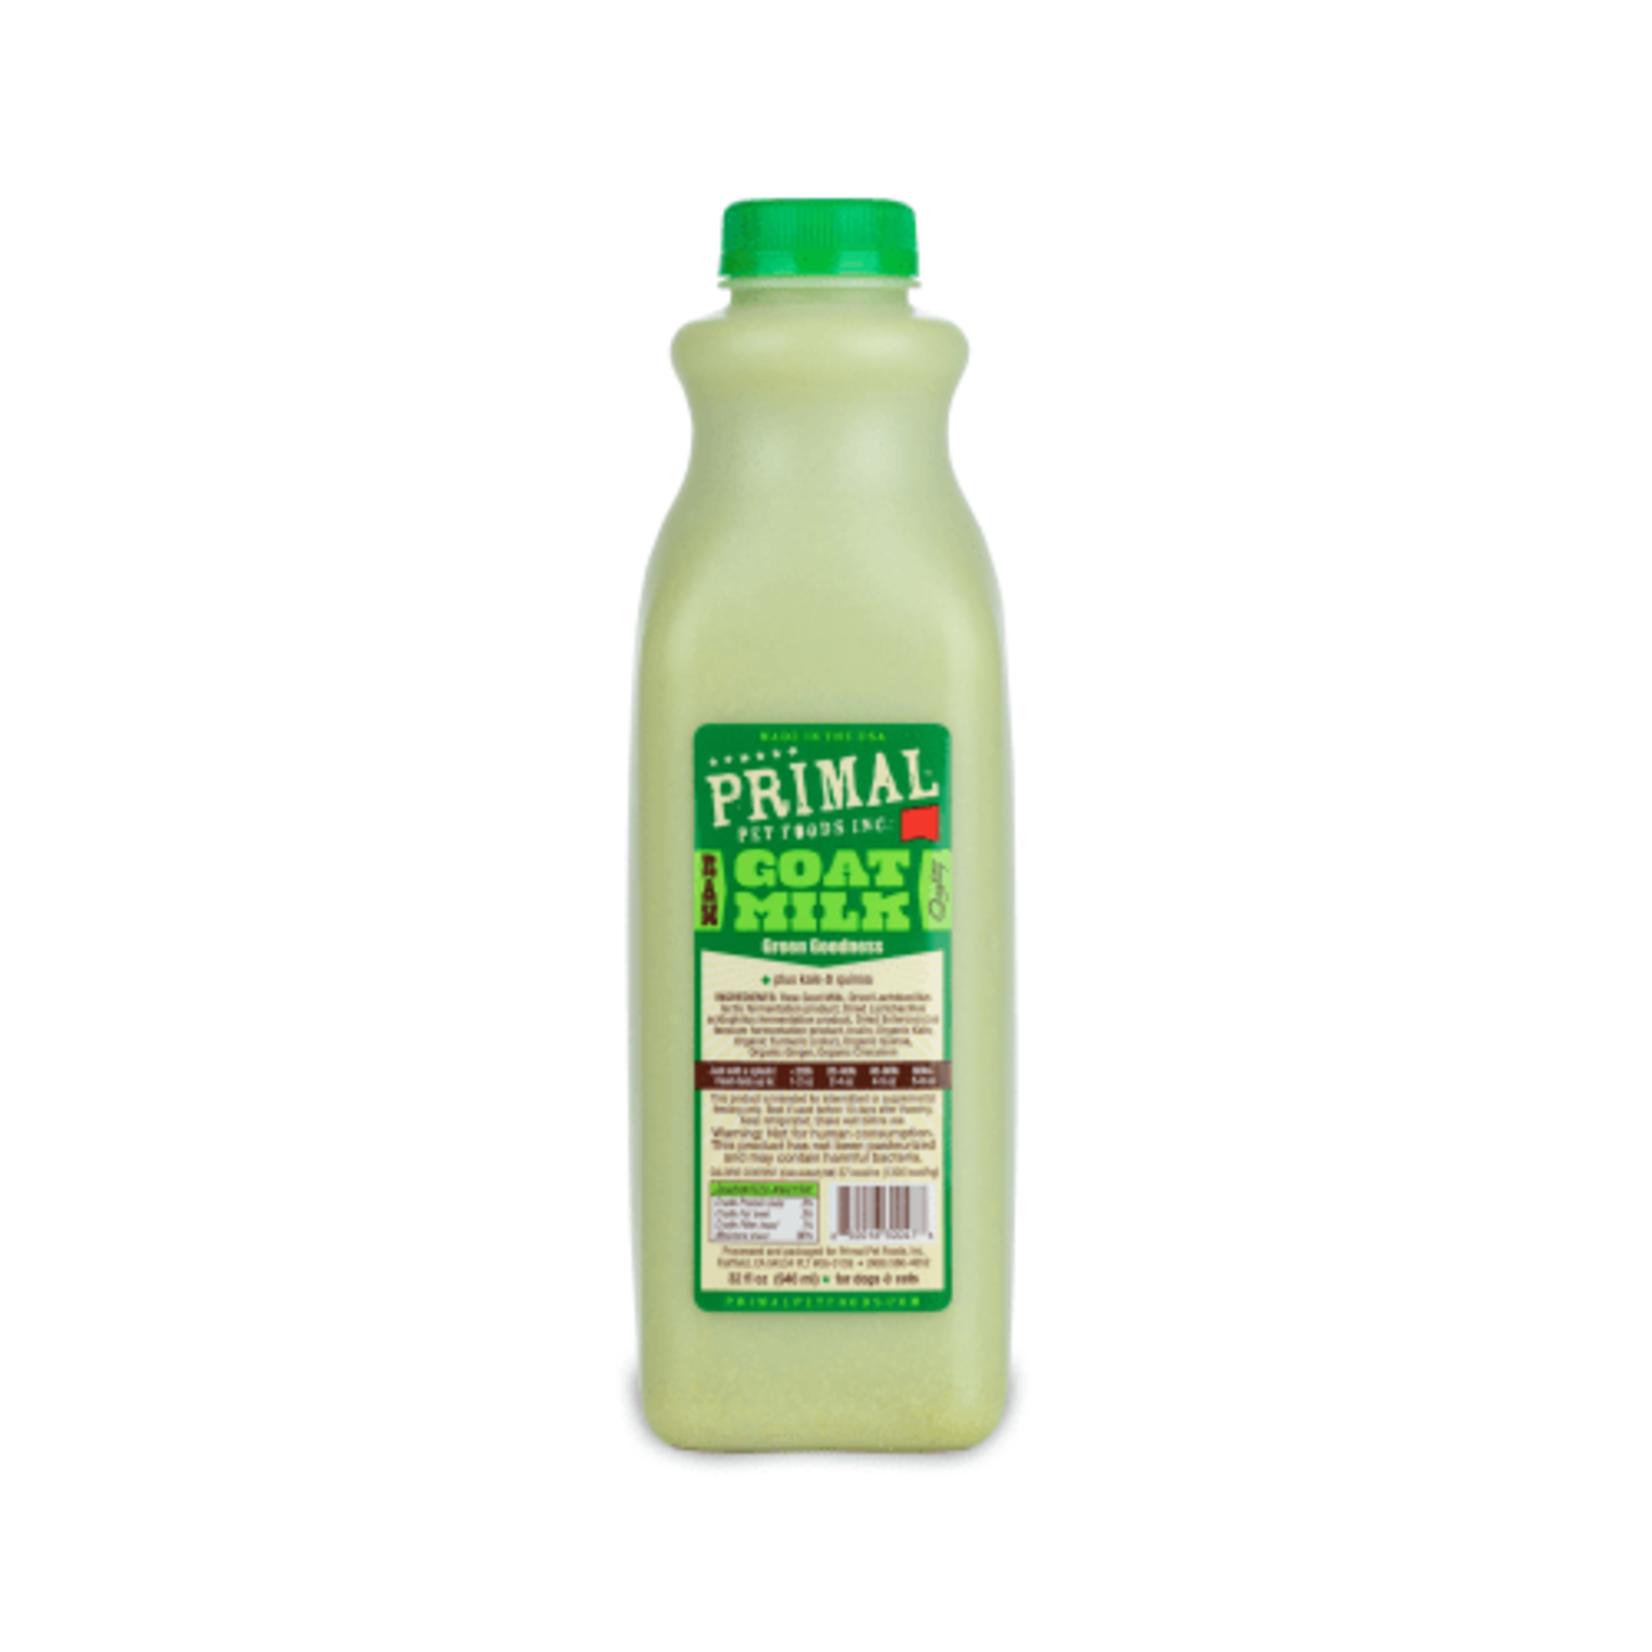 Primal Pet Foods Primal Frozen Raw Goat Milk Green Goodness 32 OZ